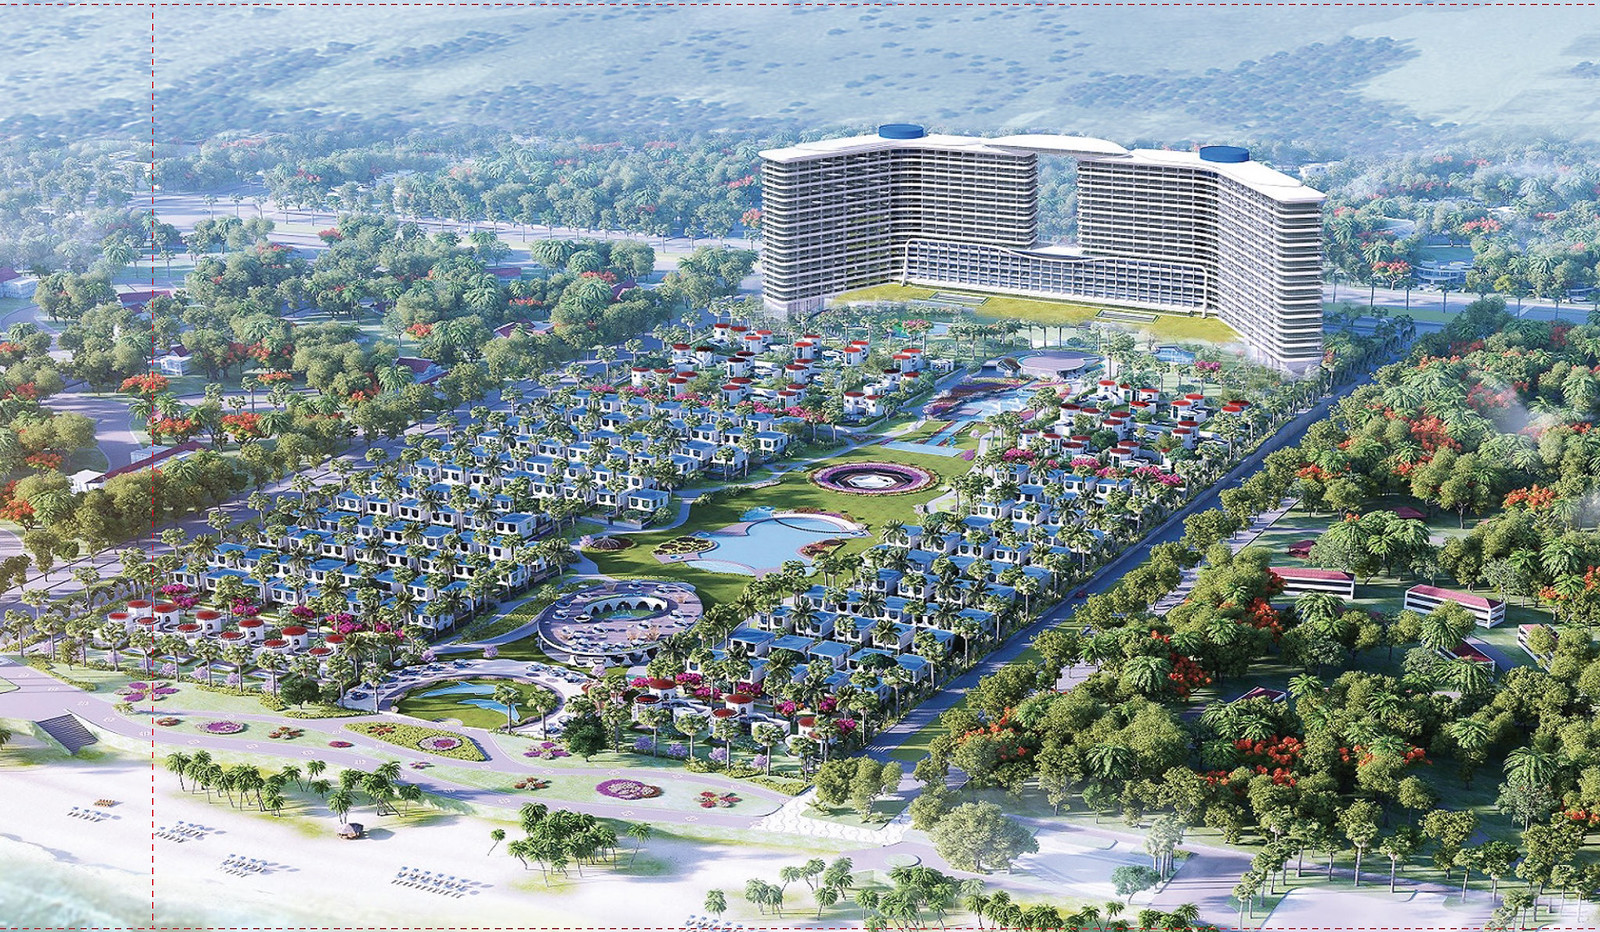 PCDA Cam Ranh Bay Villas & Condotels